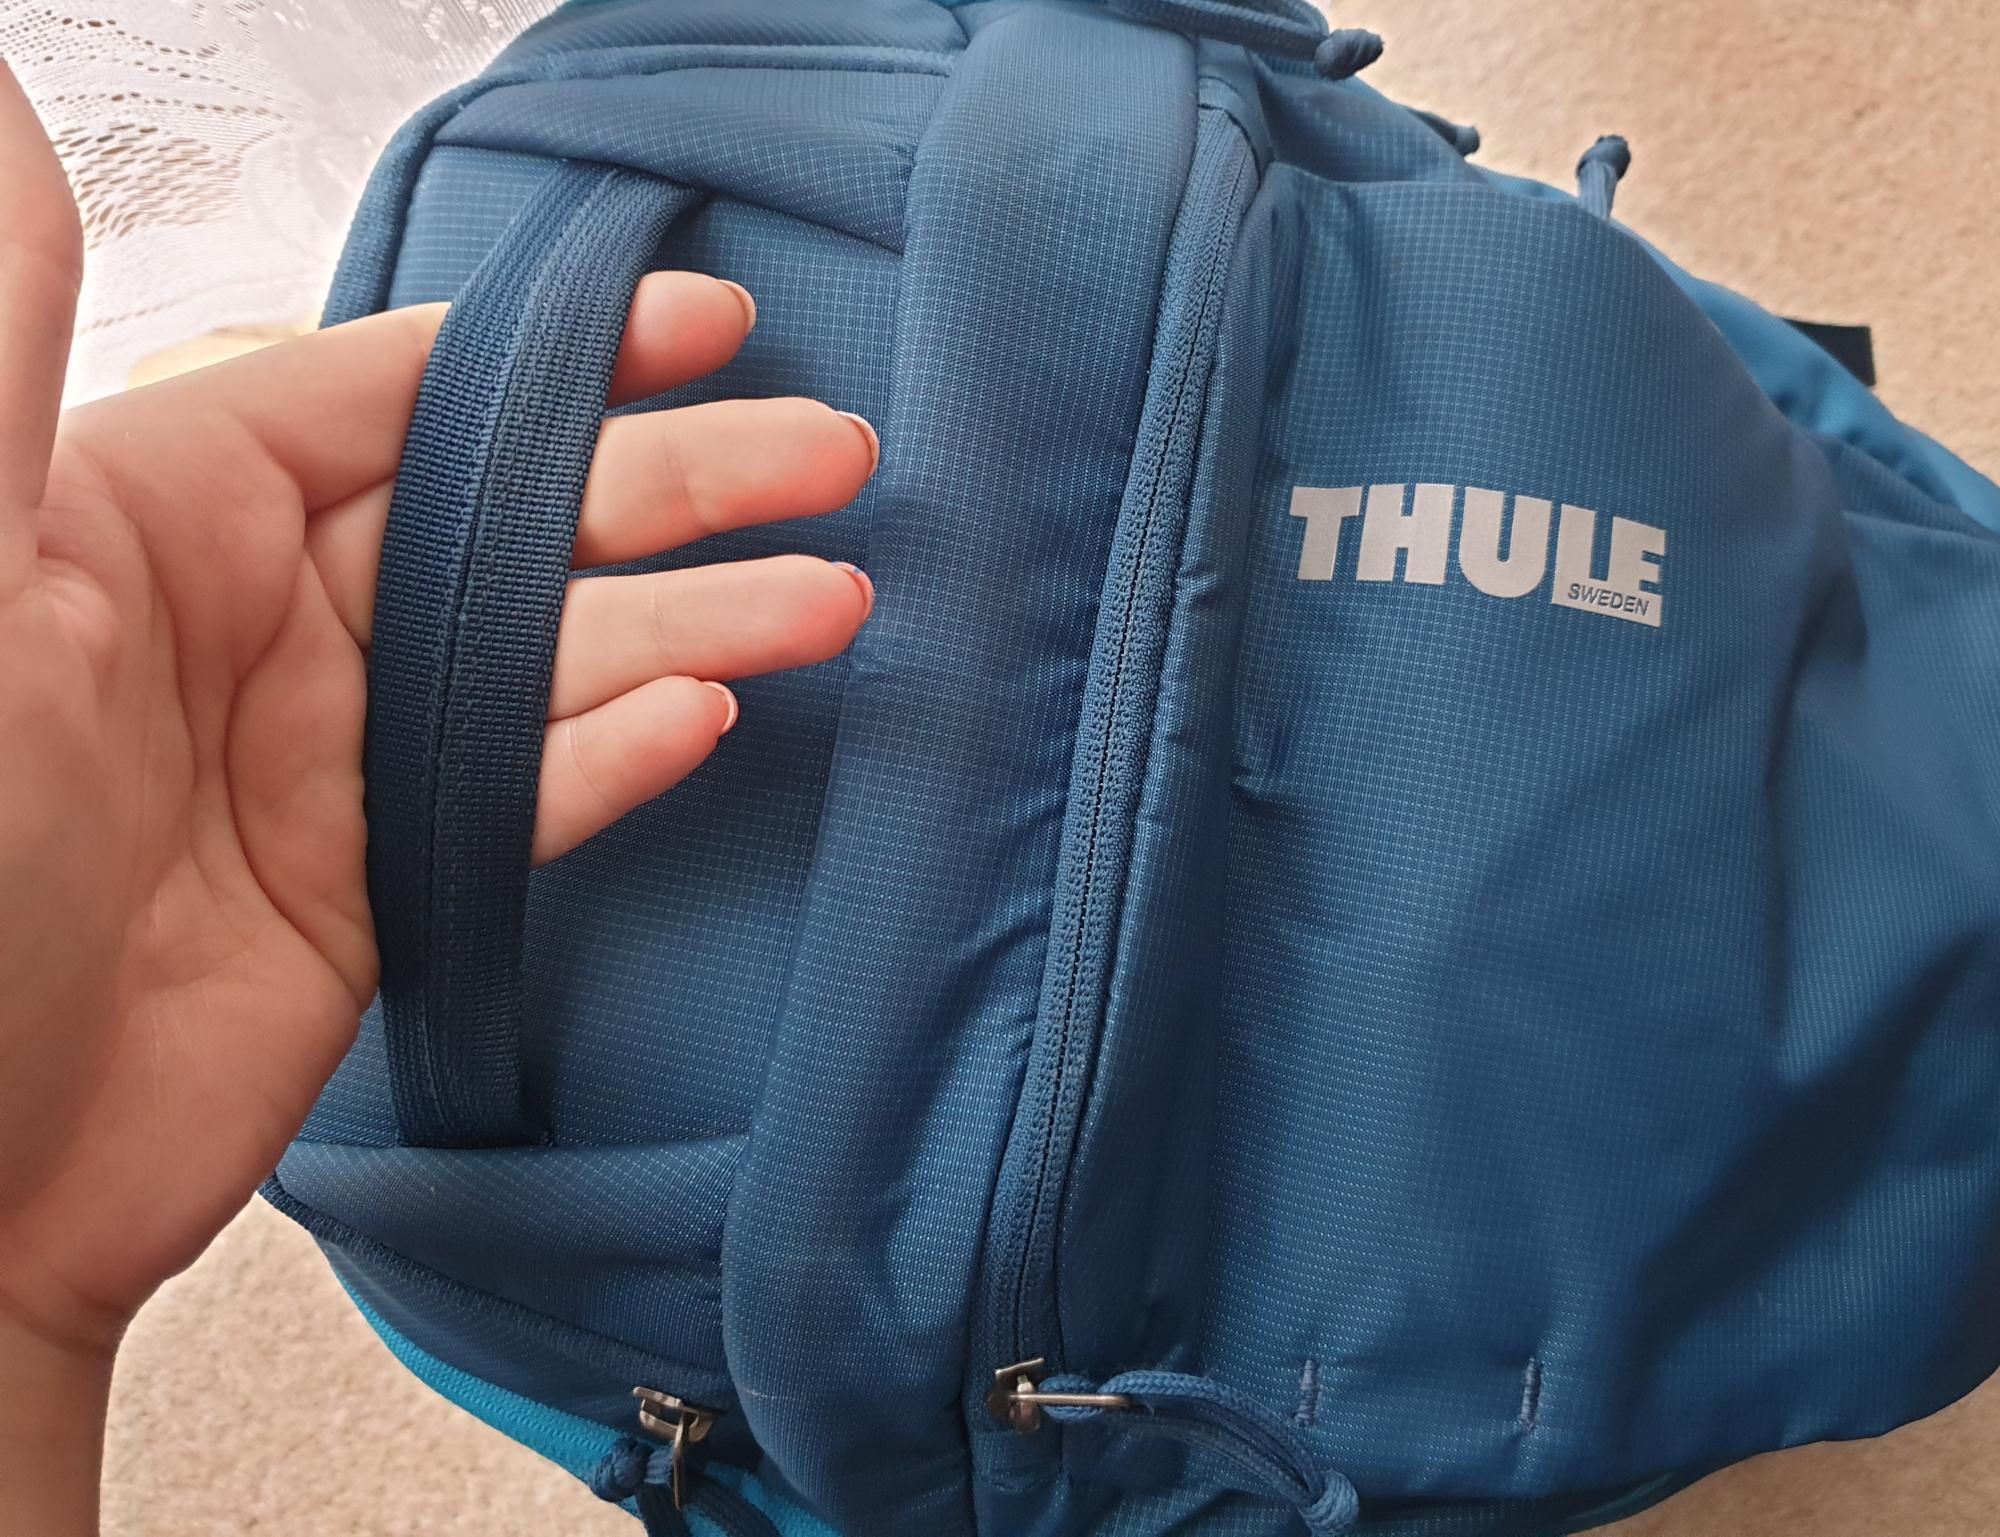 Thule EnRoute 23L - miejski plecak, który teraz kupisz o 57% taniej (opinia) 30